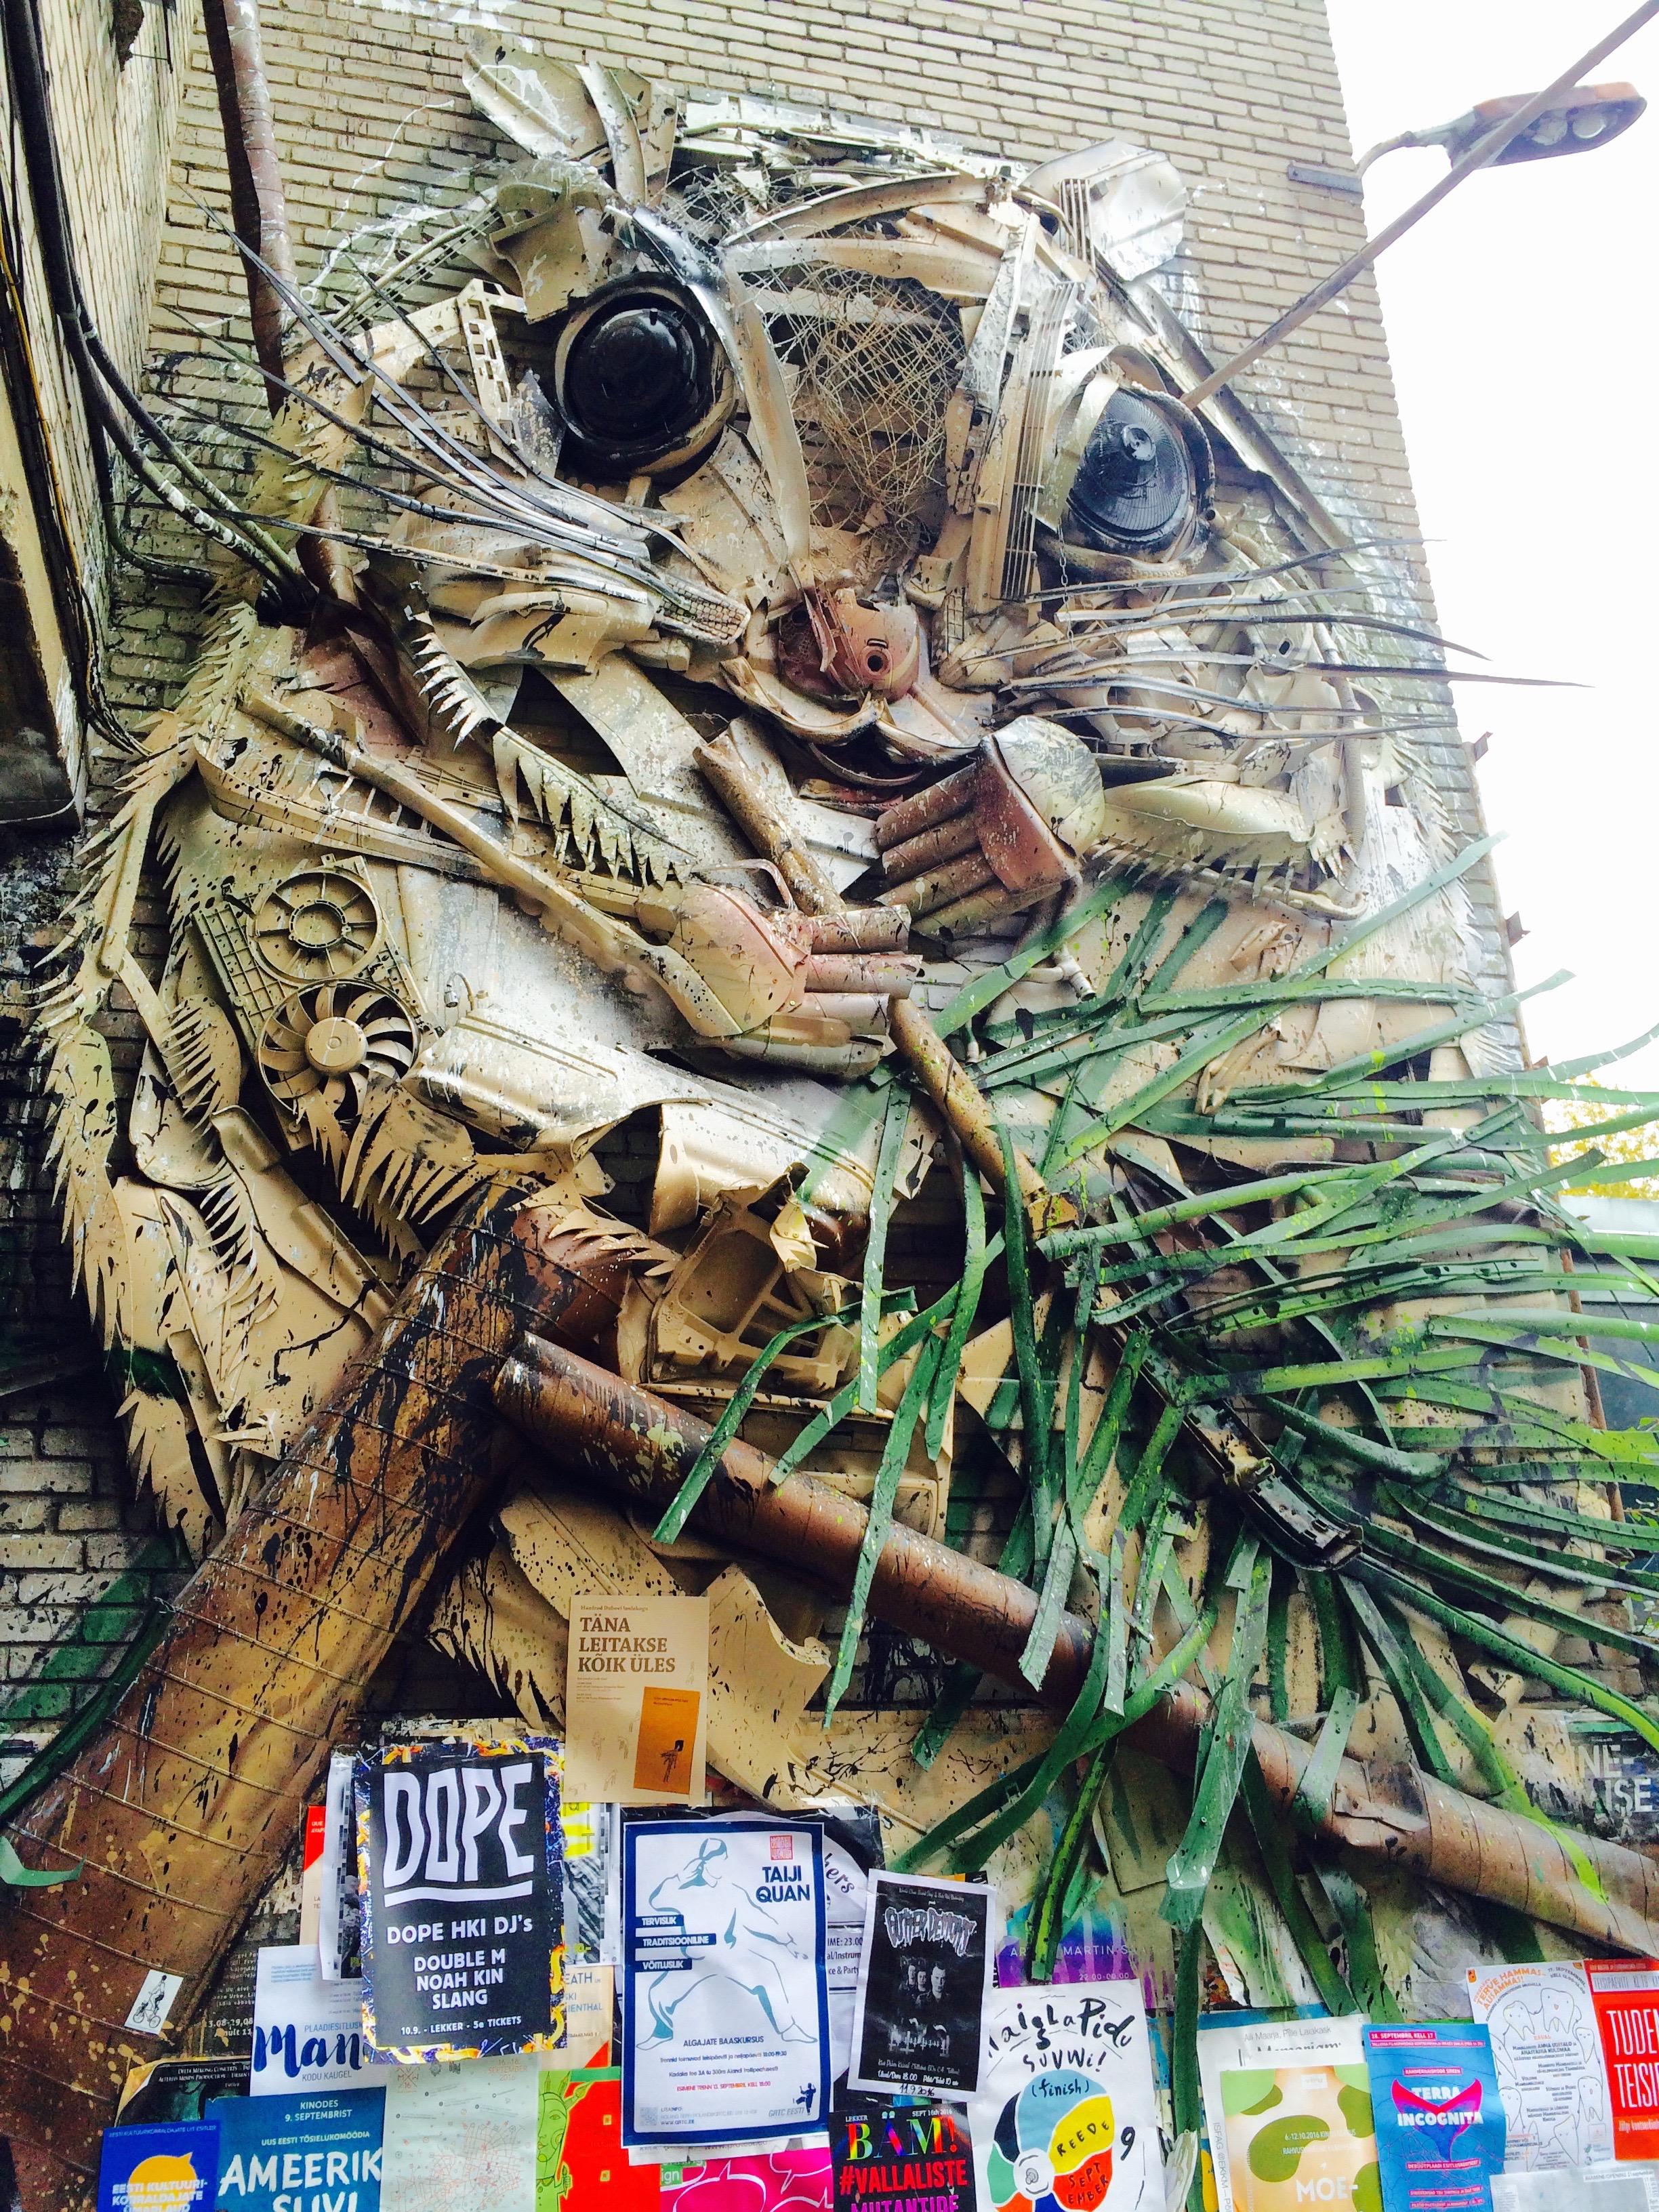 Street art of Telliskivi Loomelinnak: Giant hamster